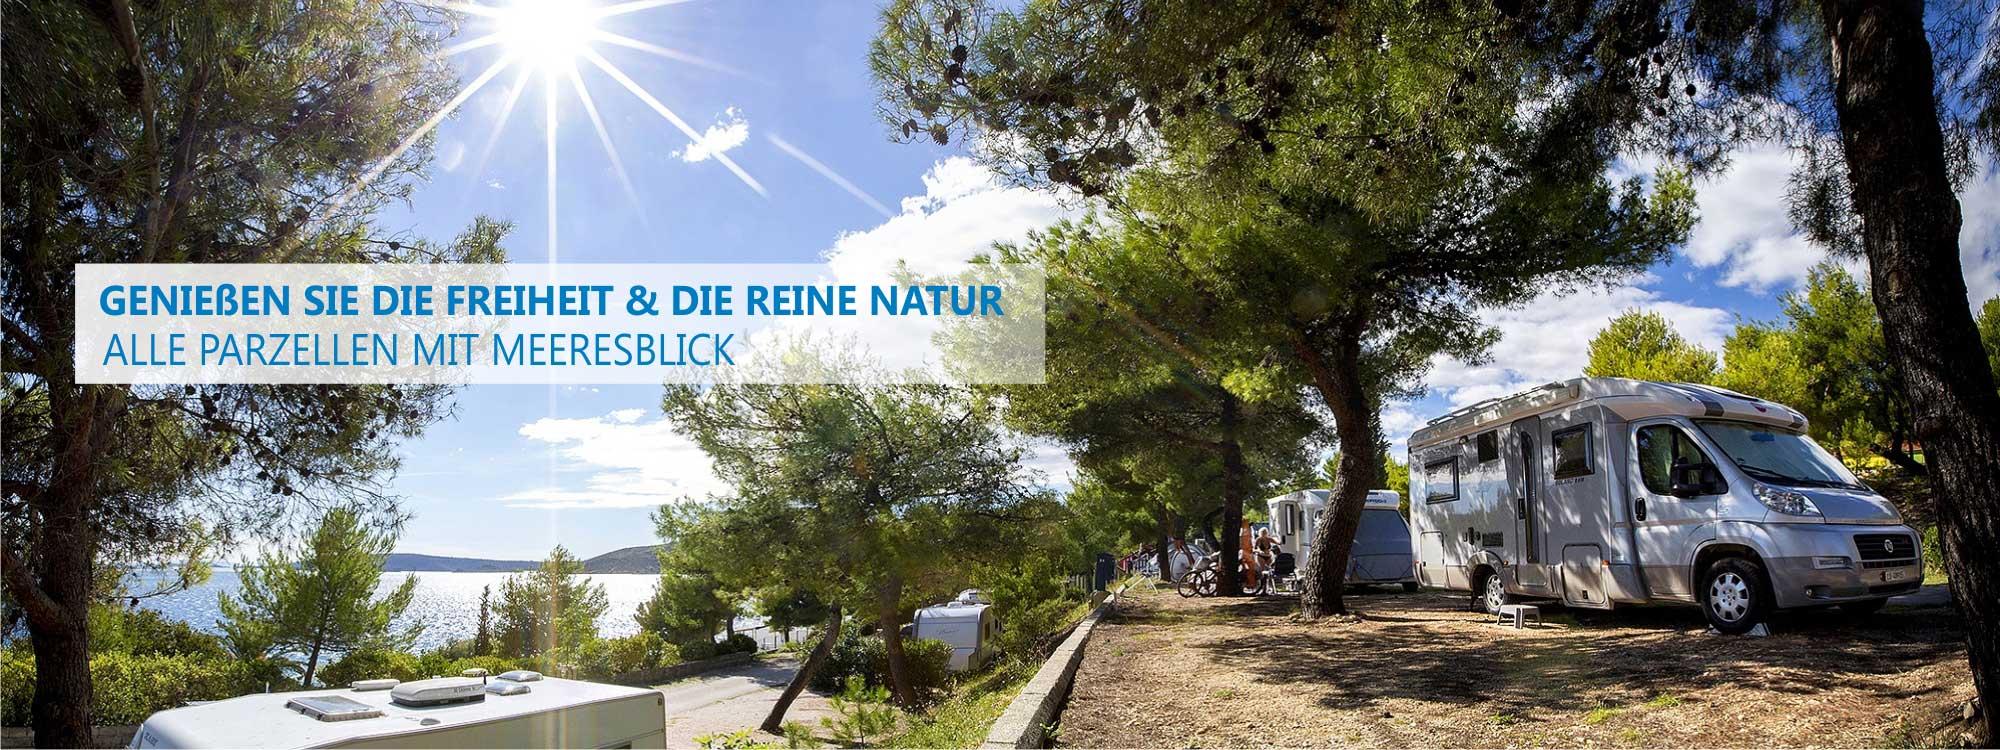 Belvedere_camping_parzellen